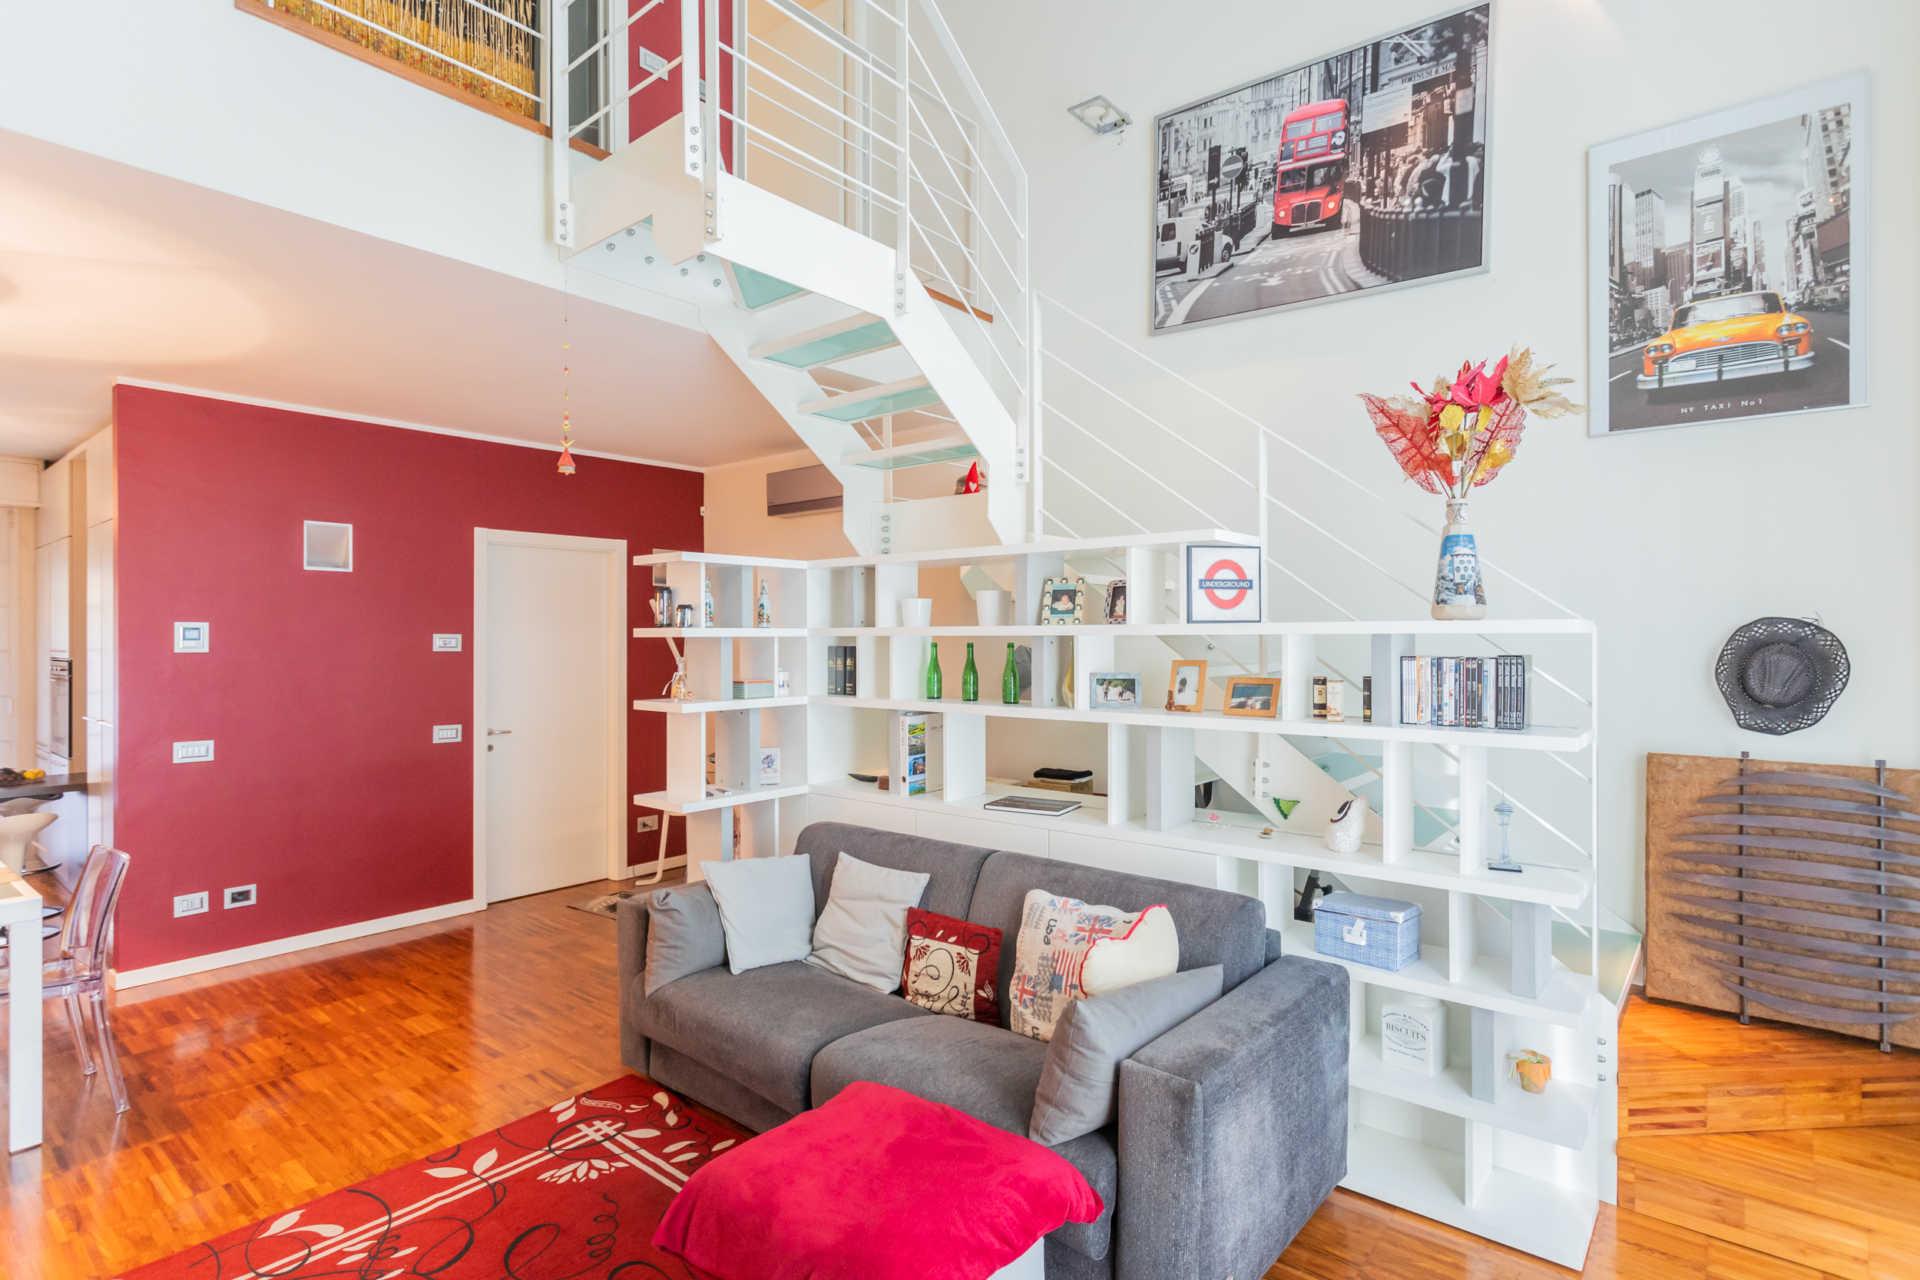 appartamento_brugherio-29